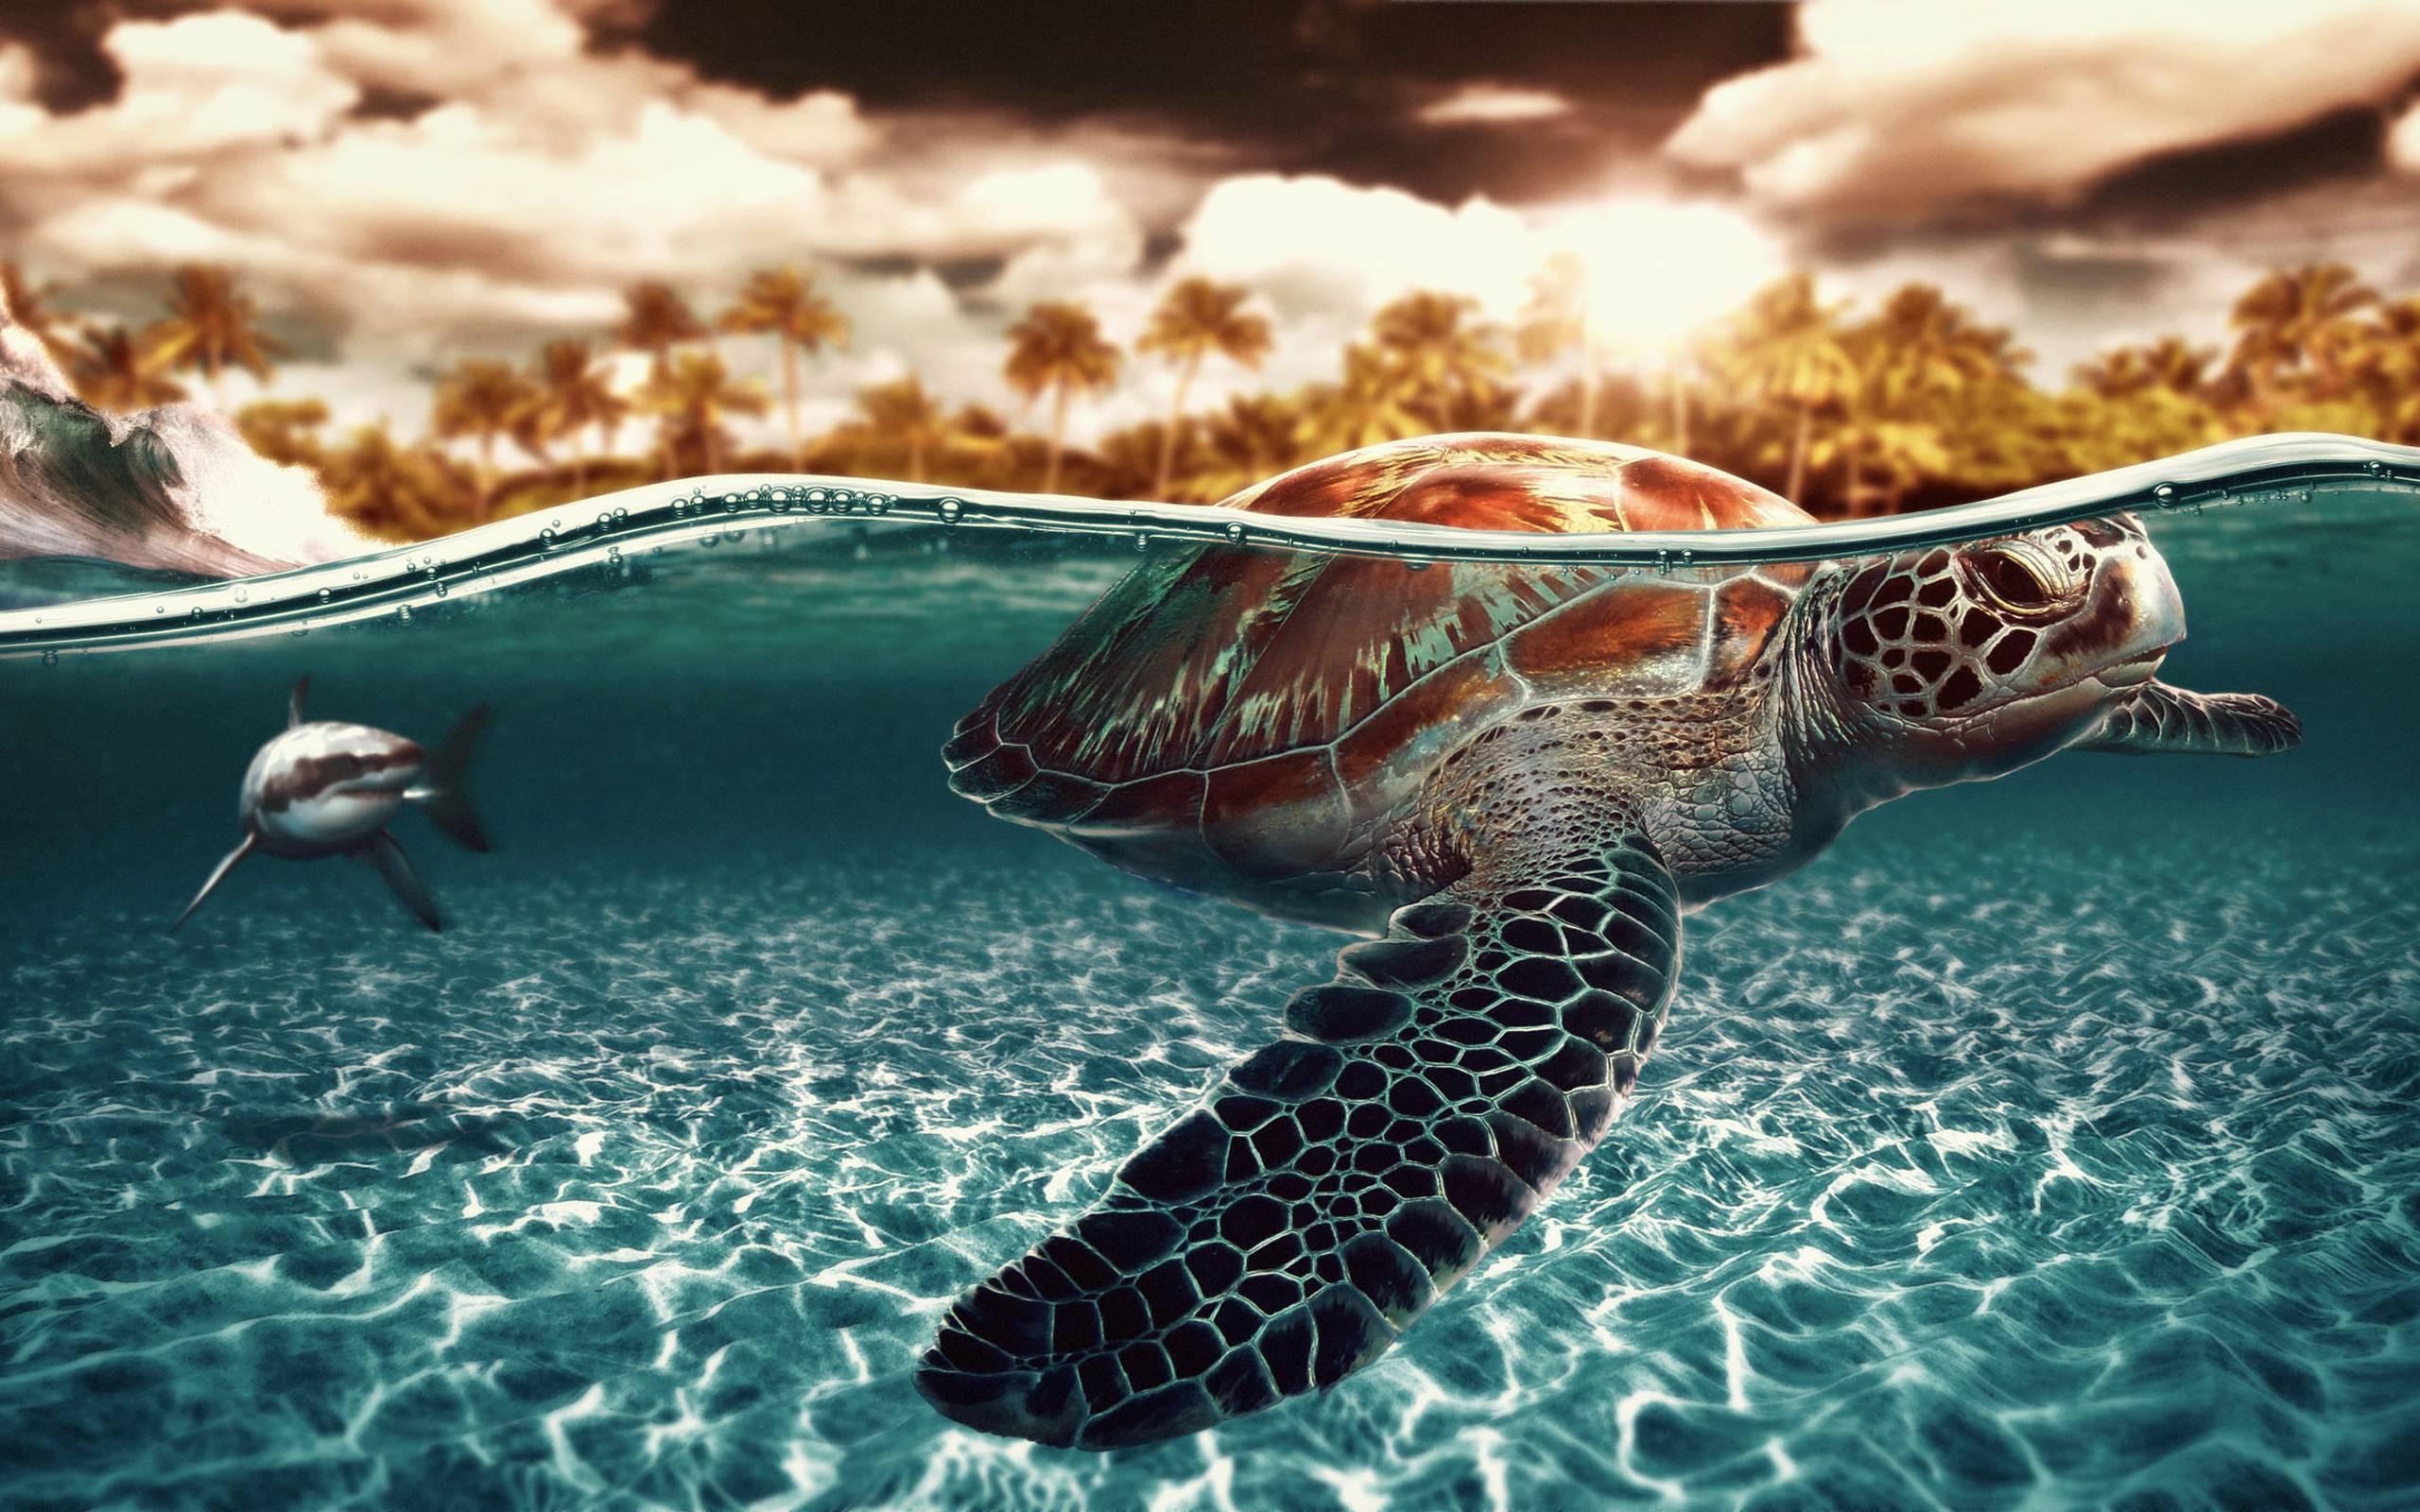 Top 27 Sea Animals Wallpapers In Hd: Sea Turtles Wallpapers